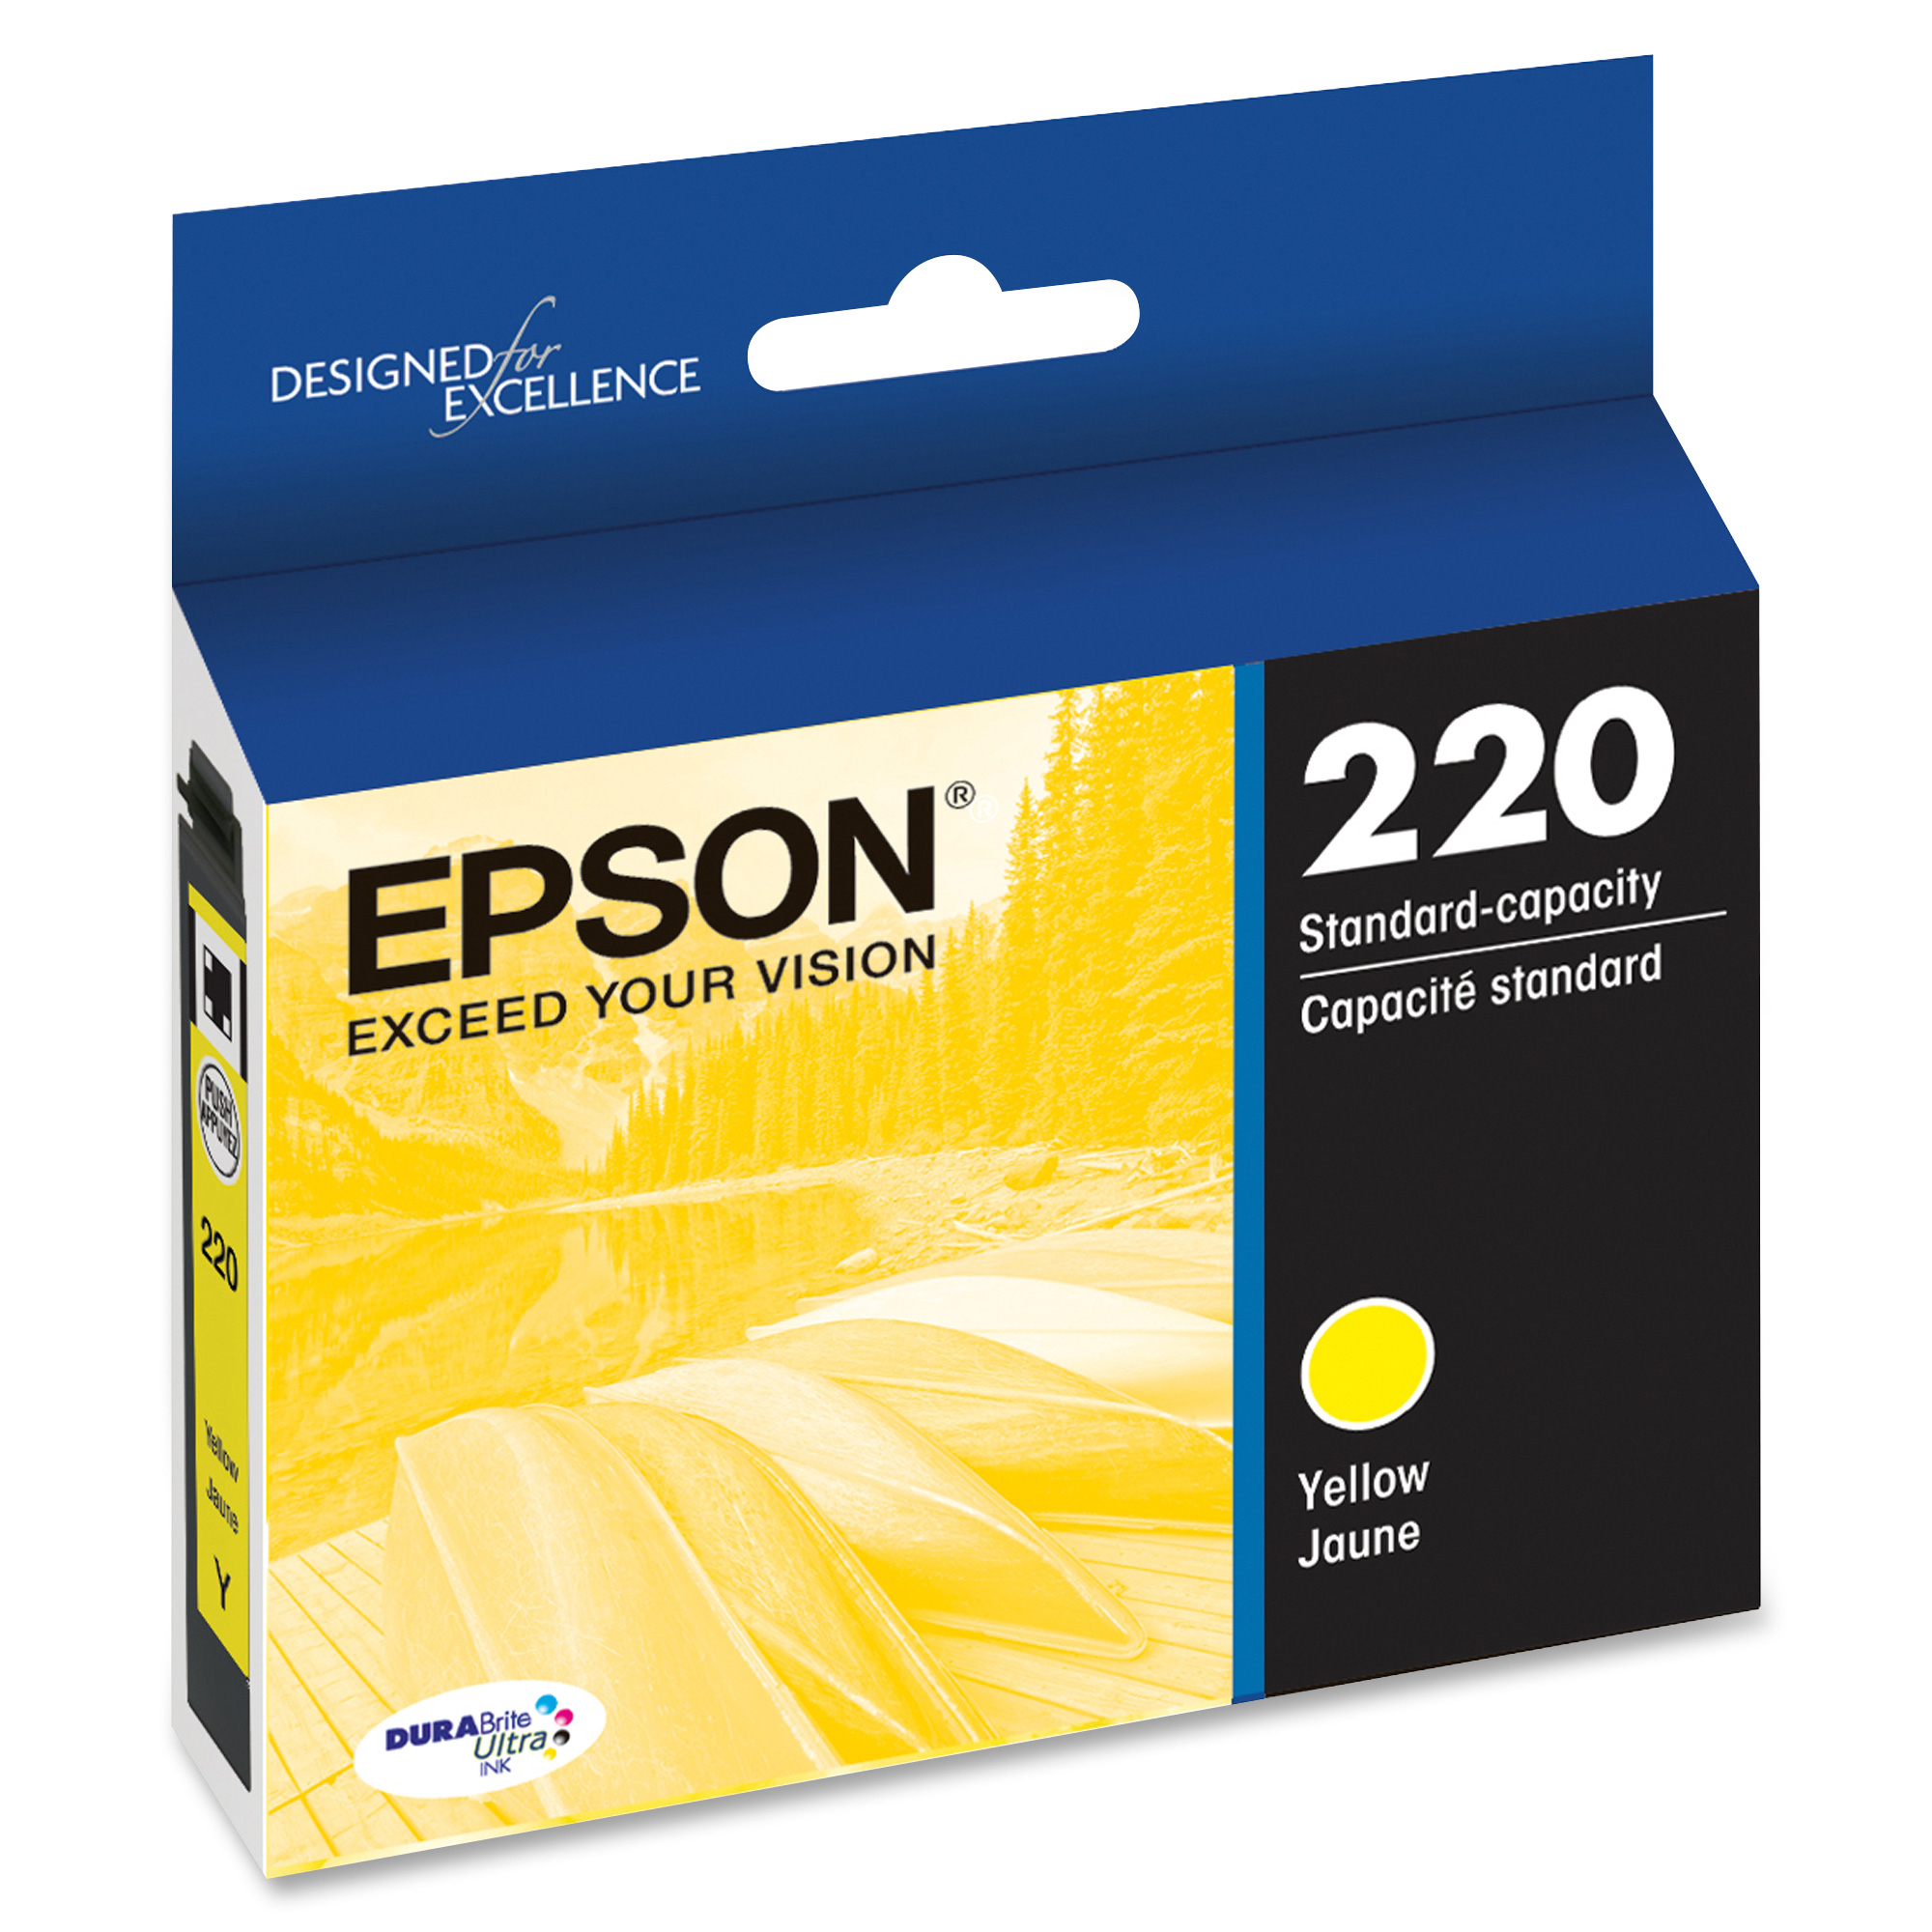 Epson DURABrite Ultra 220 Original Ink Cartridge - Yellow